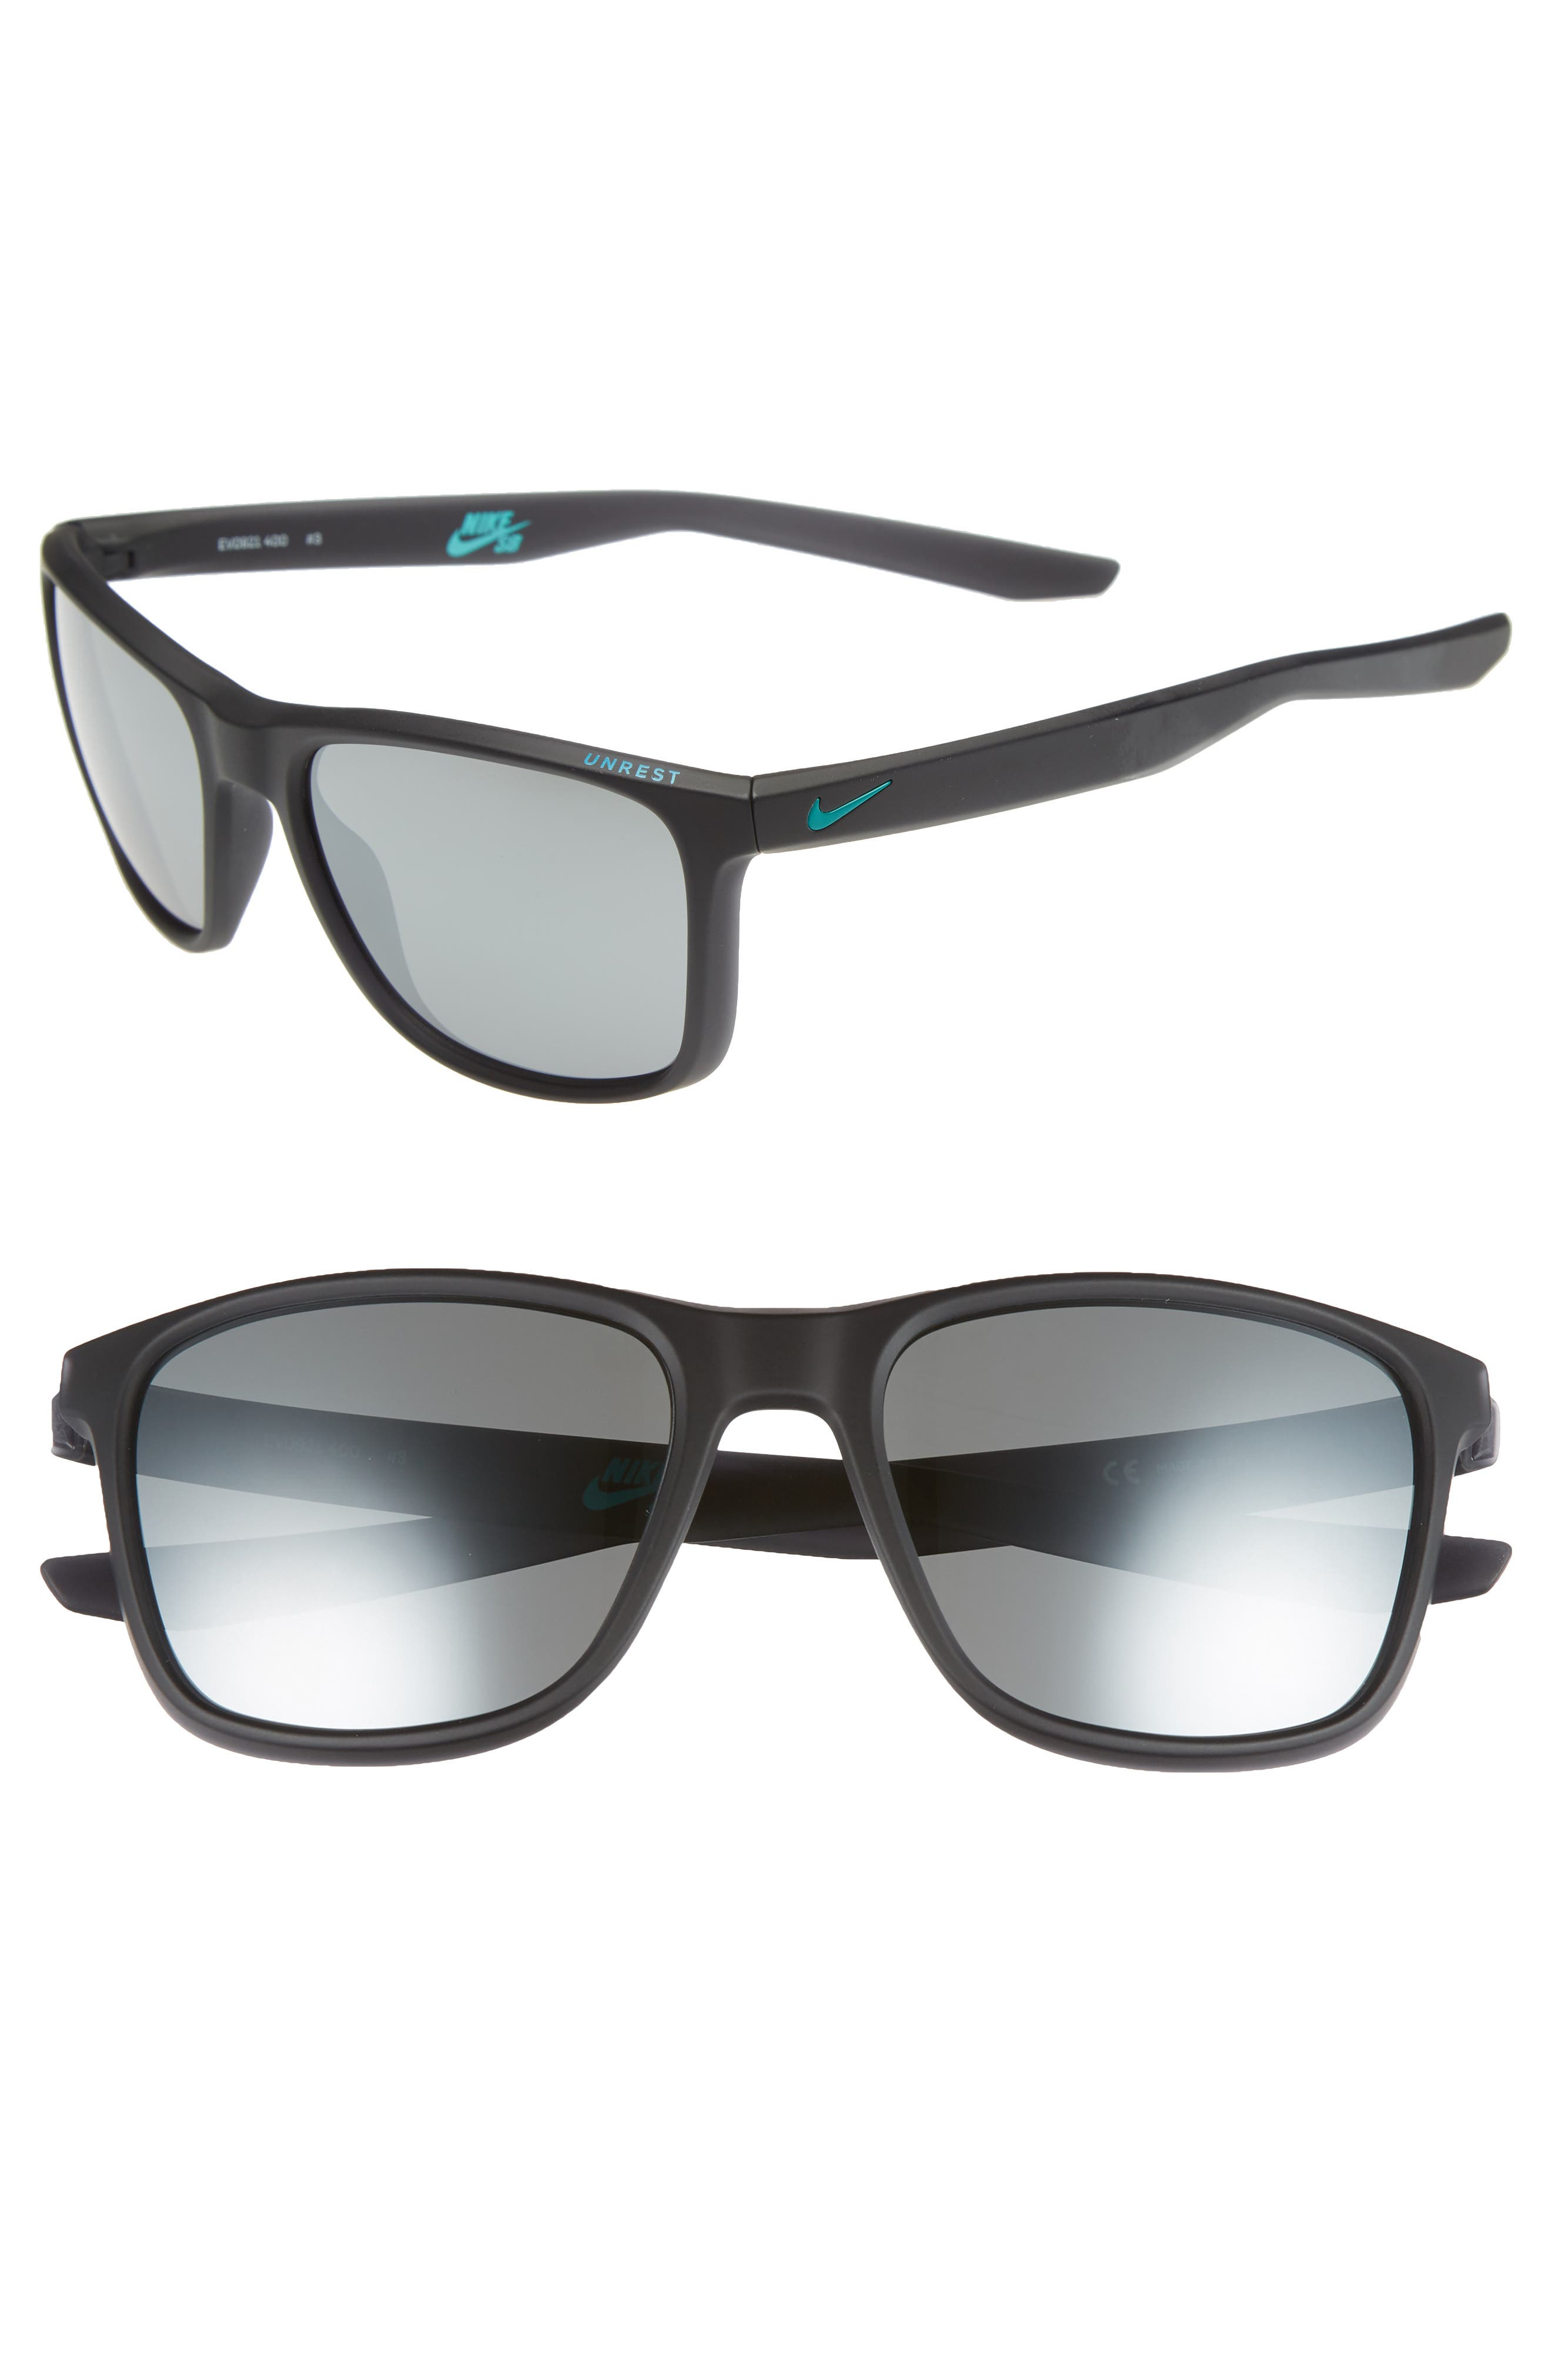 NIKE, Unrest 57mm Sunglasses, Main thumbnail 1, color, MATTE OBSIDIAN/ GREY SILVER